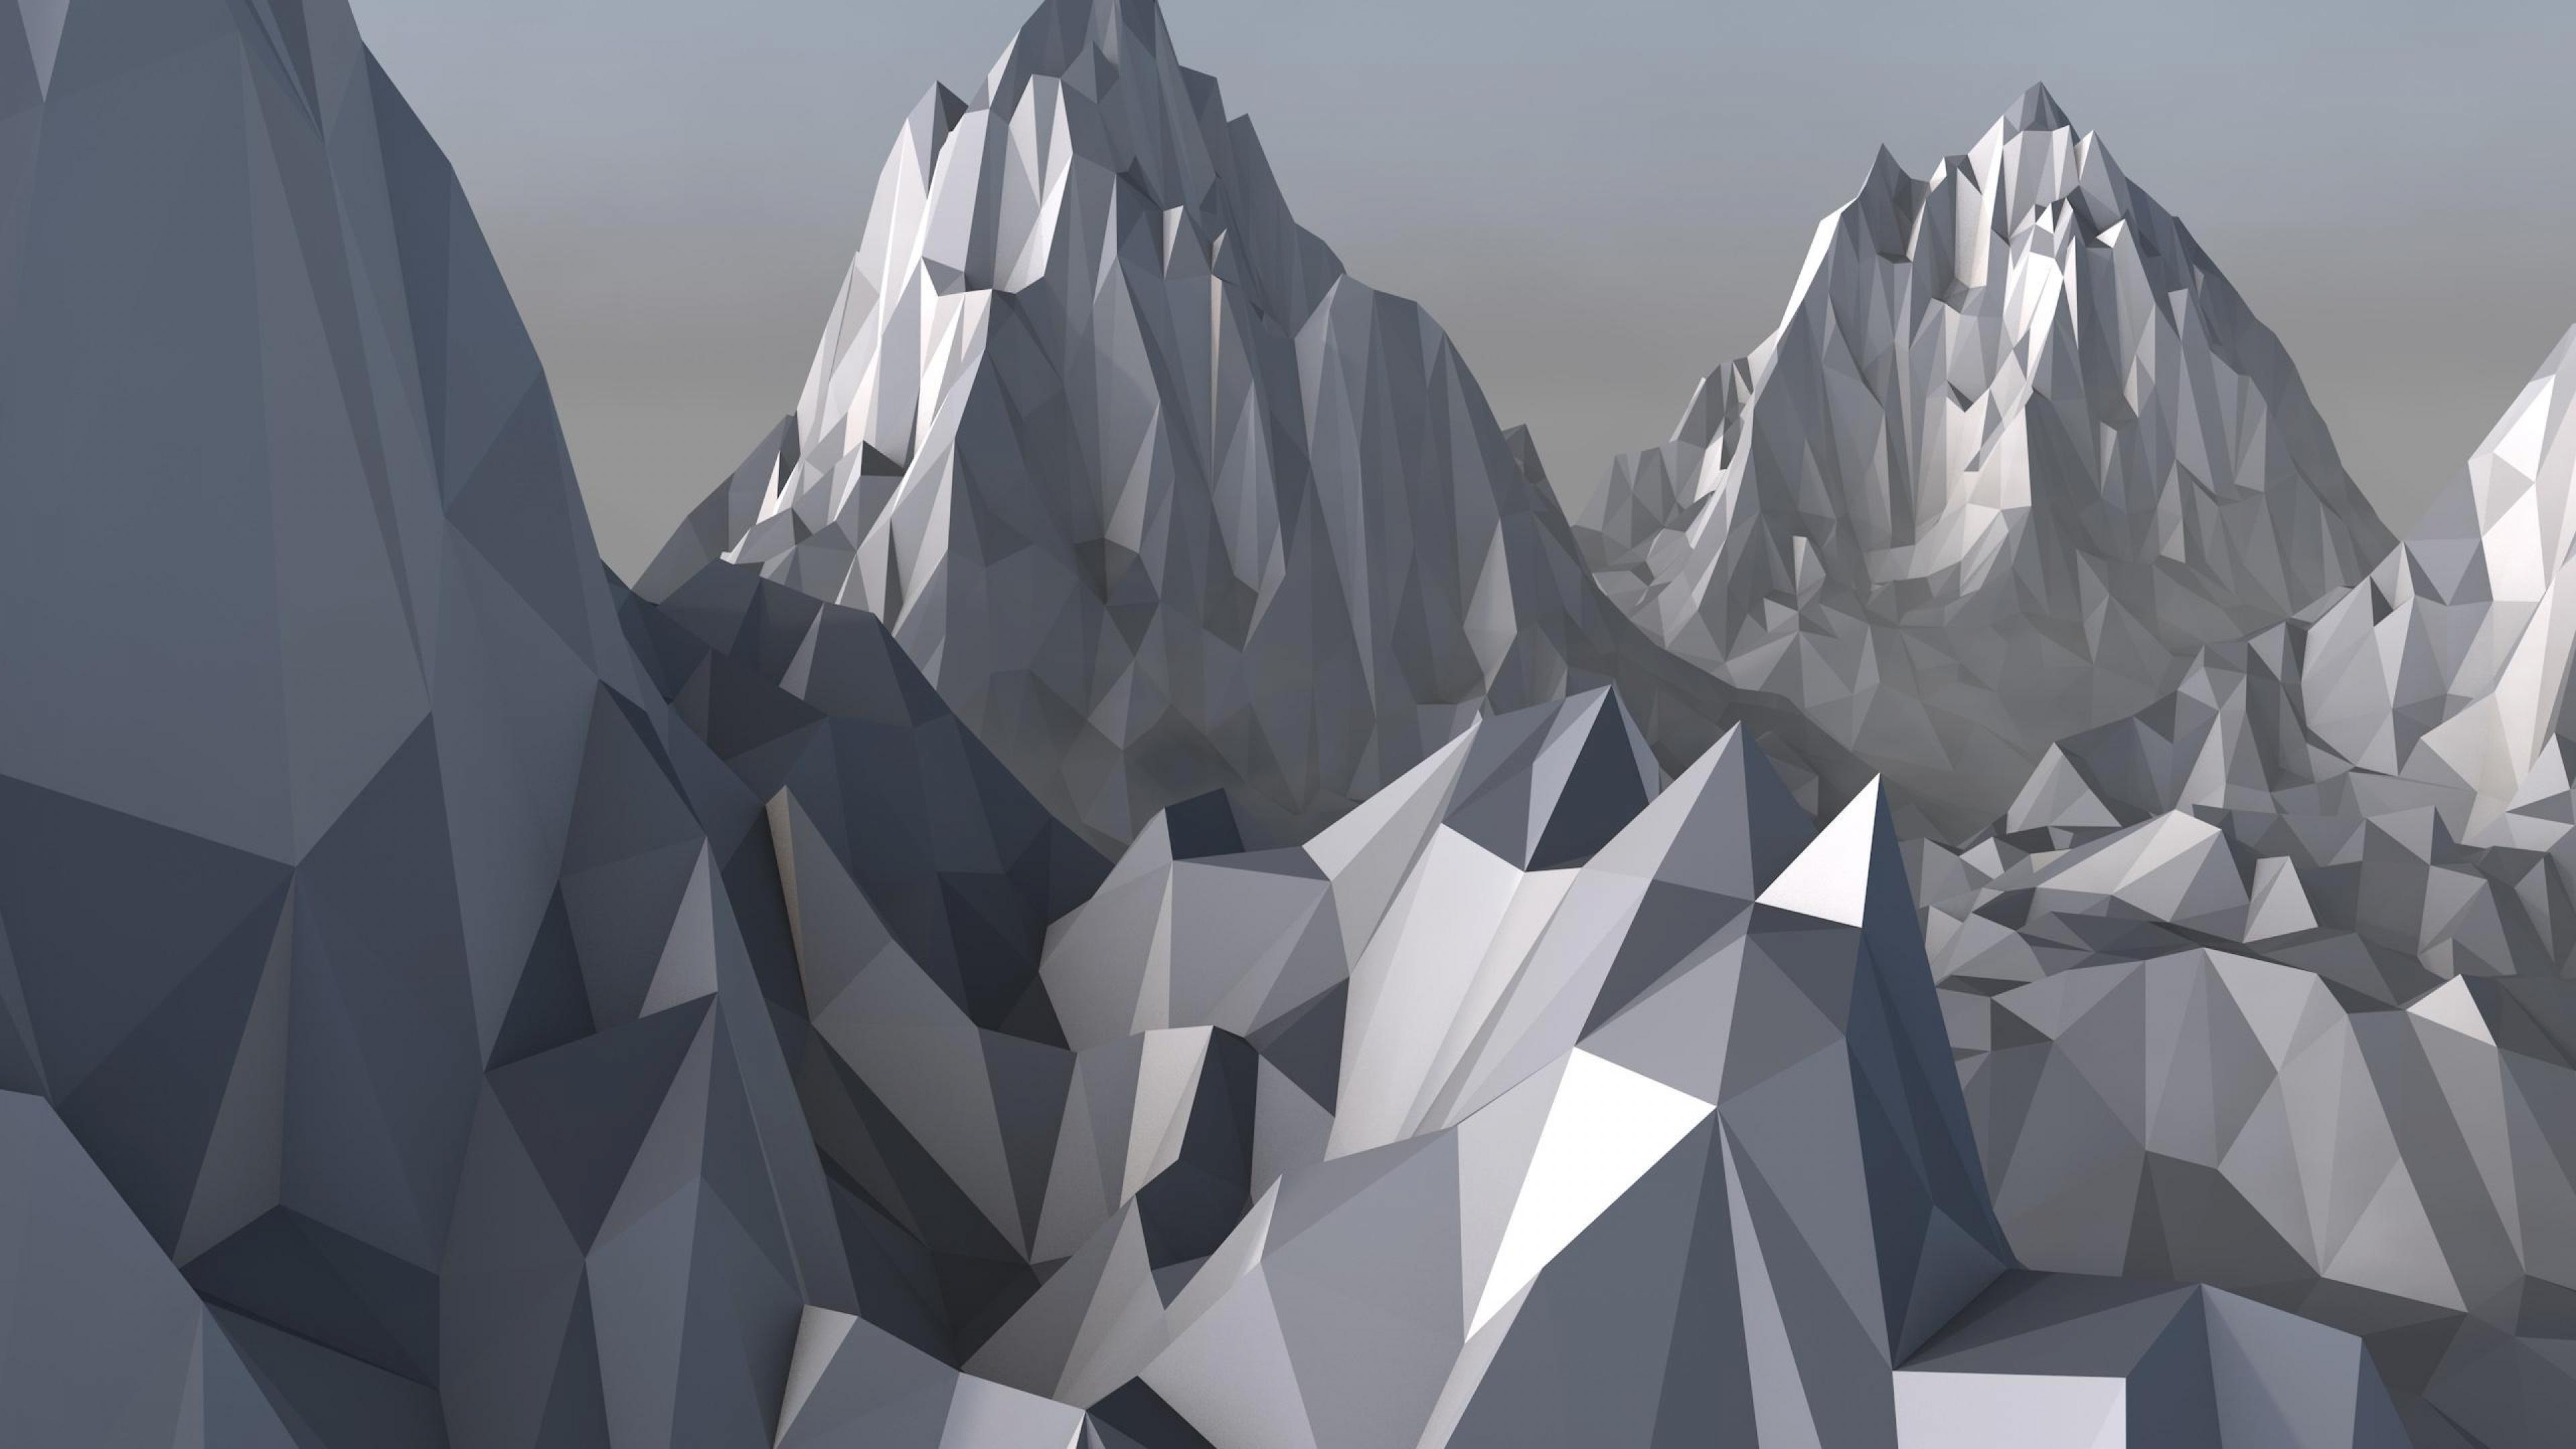 polygon mountain wallpaper - photo #22